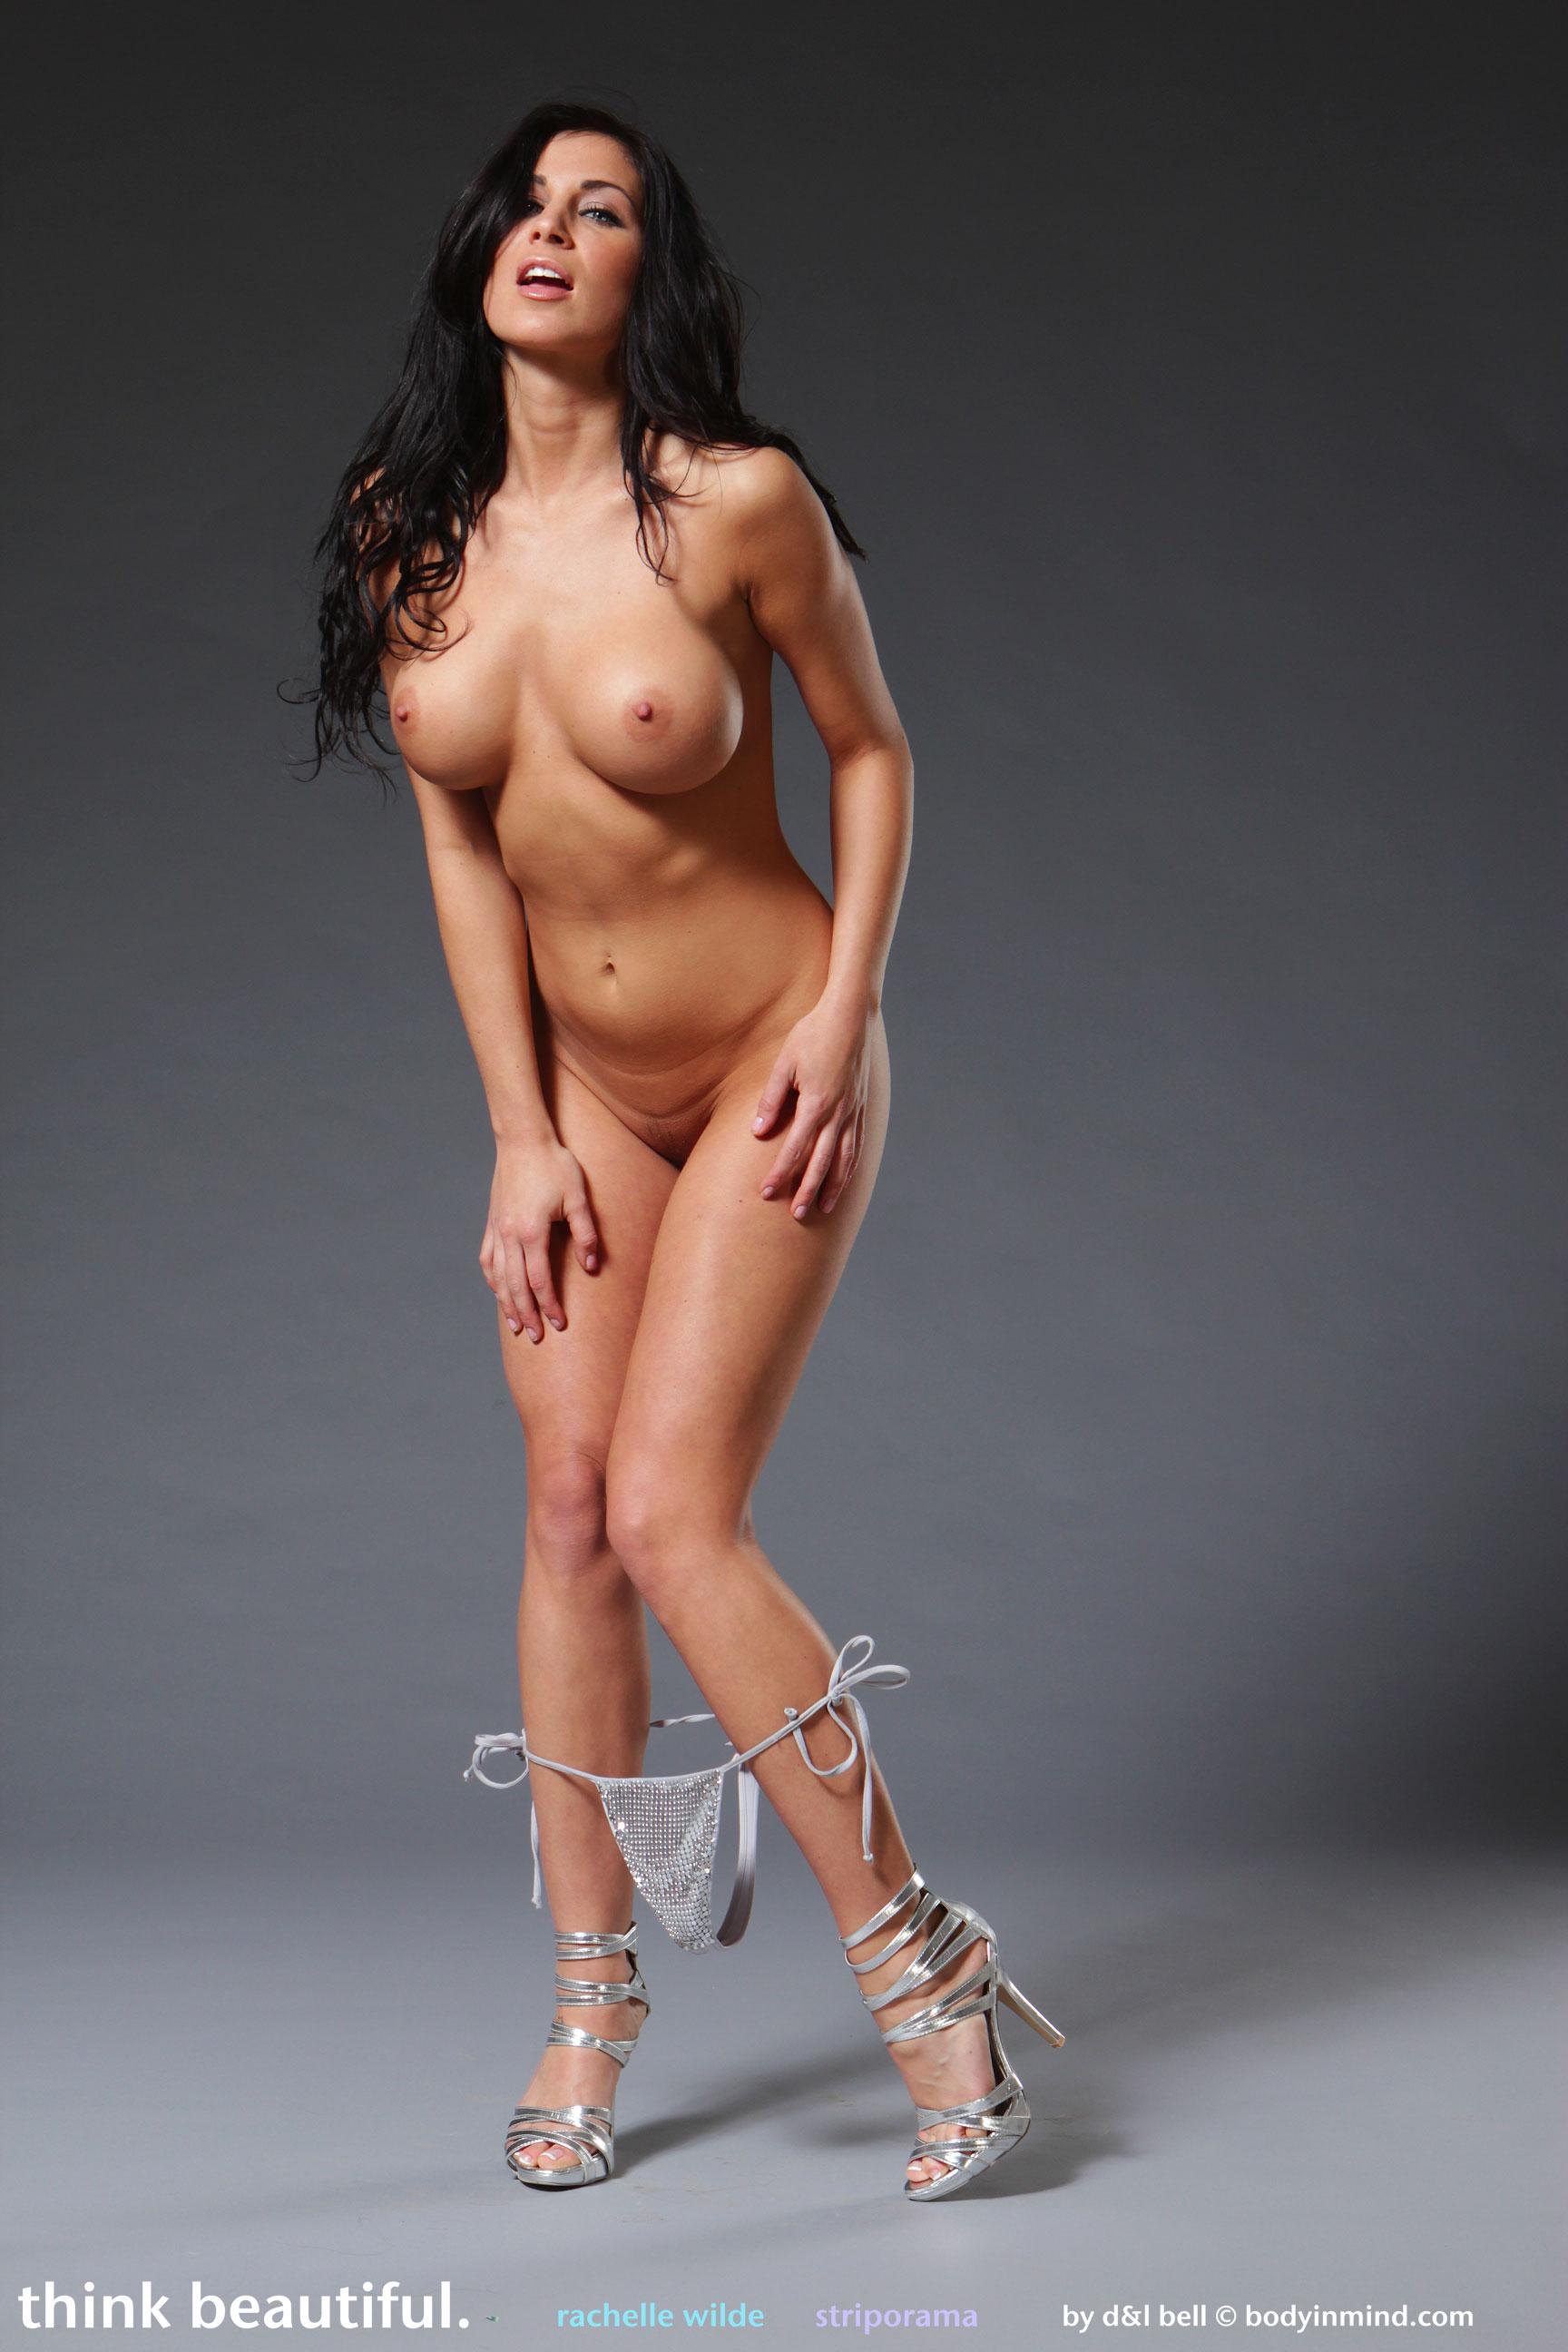 Watch my wife undress